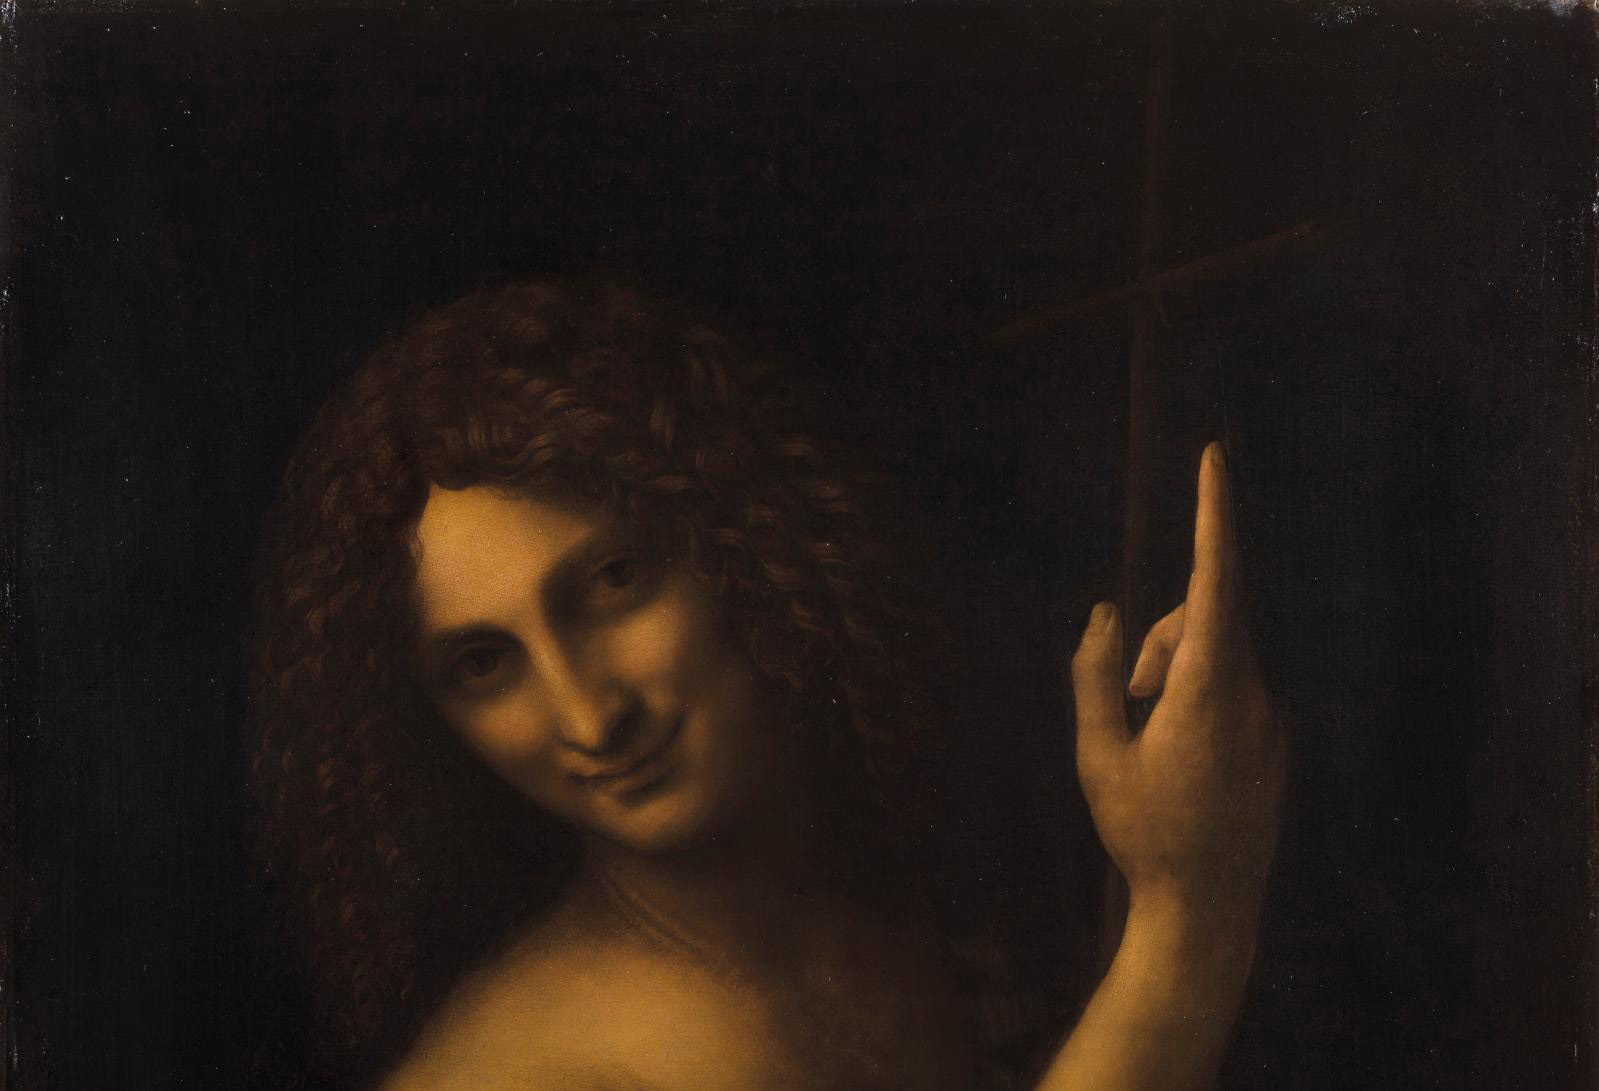 Leonardo da Vinci (1452-1519), Saint John the Baptist, Paris, France, Louvre Museum, Department of Paintings, INV 775/MR 318, between 1513